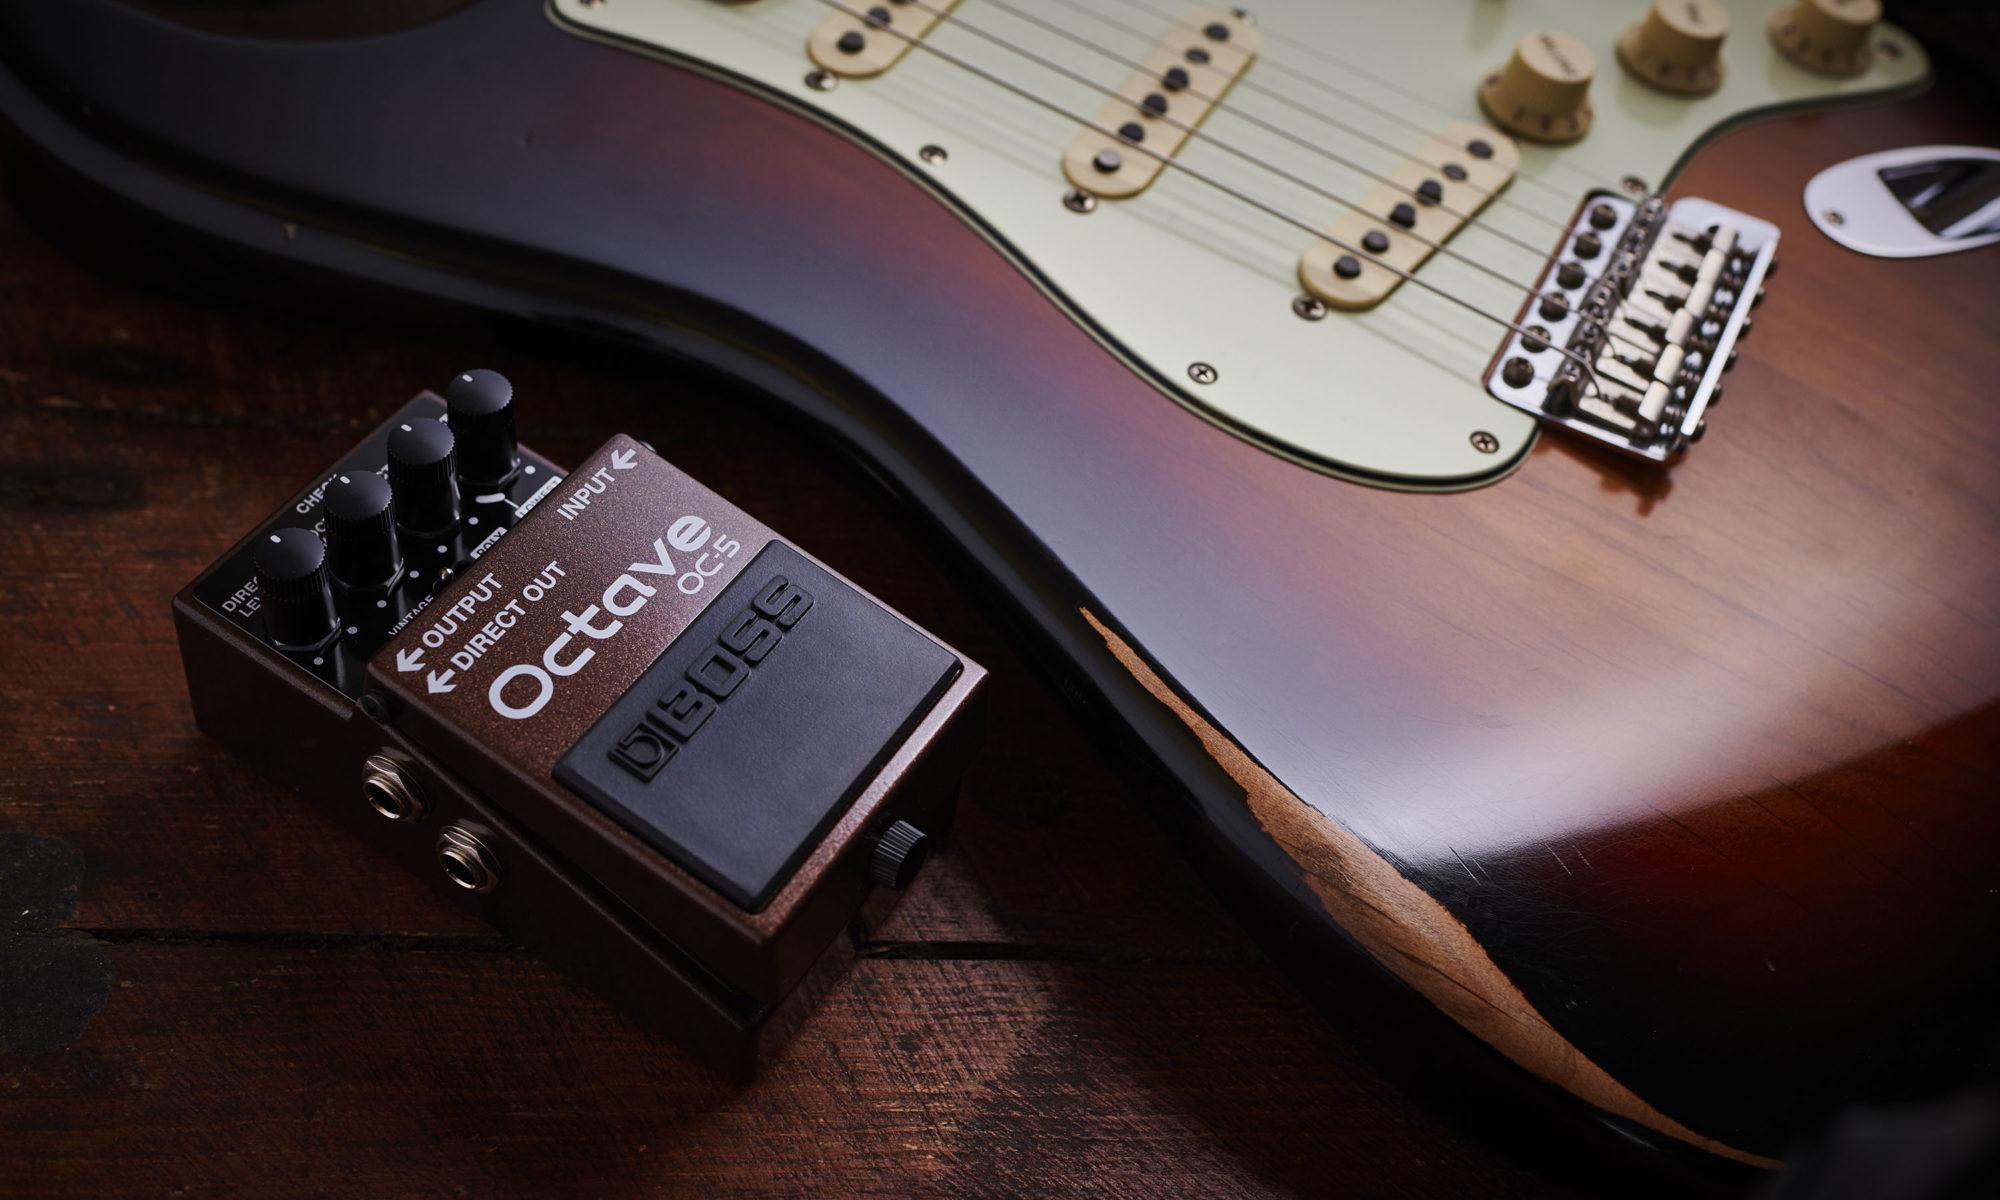 Boss OC-5 Octave met Stratocaster gitaar